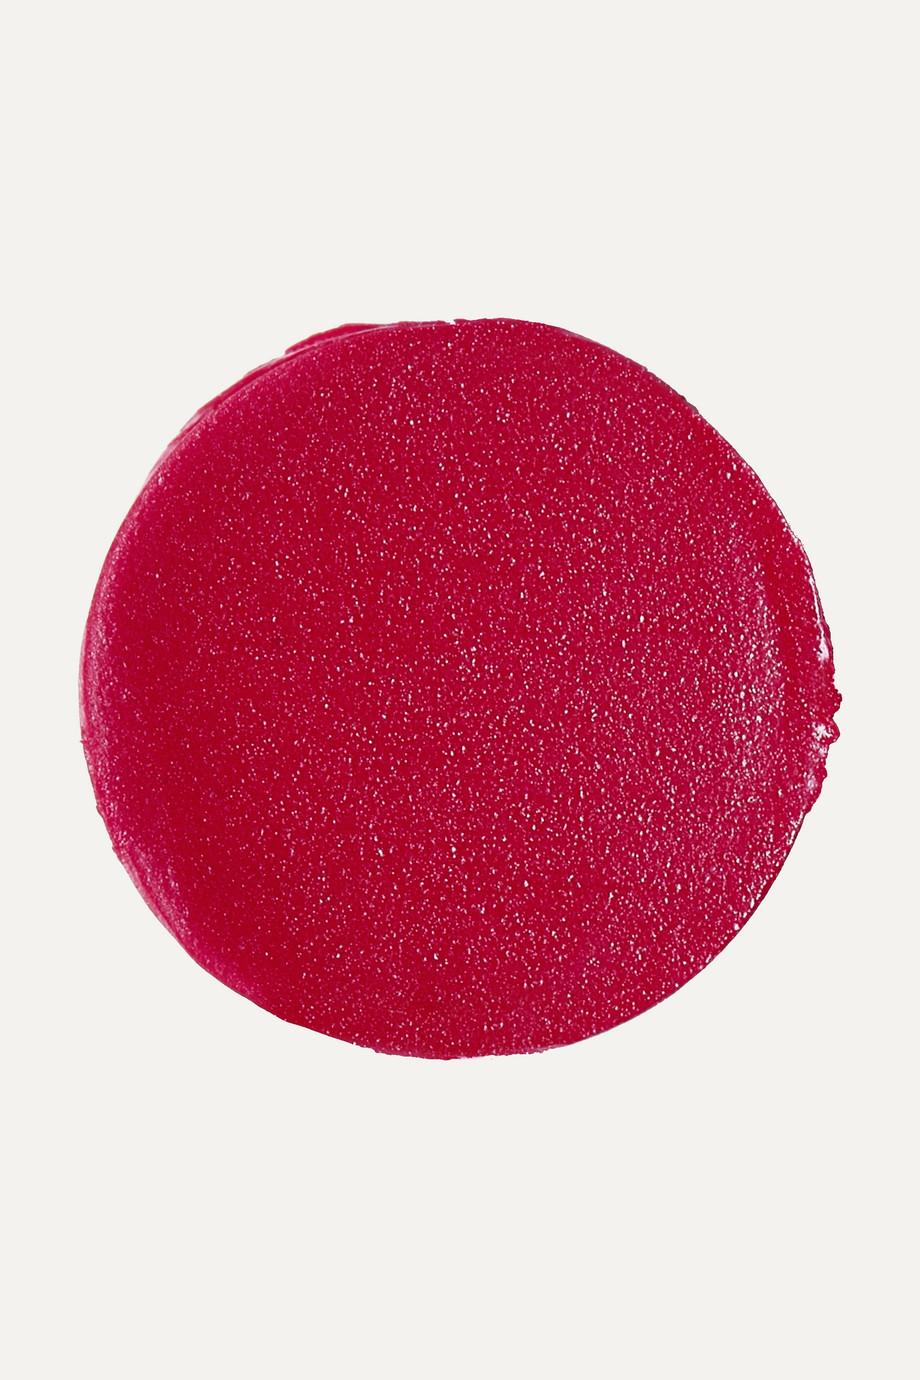 Gucci Beauty Rouge à Lèvres Satin – Love Before Breakfast 403 – Lippenstift